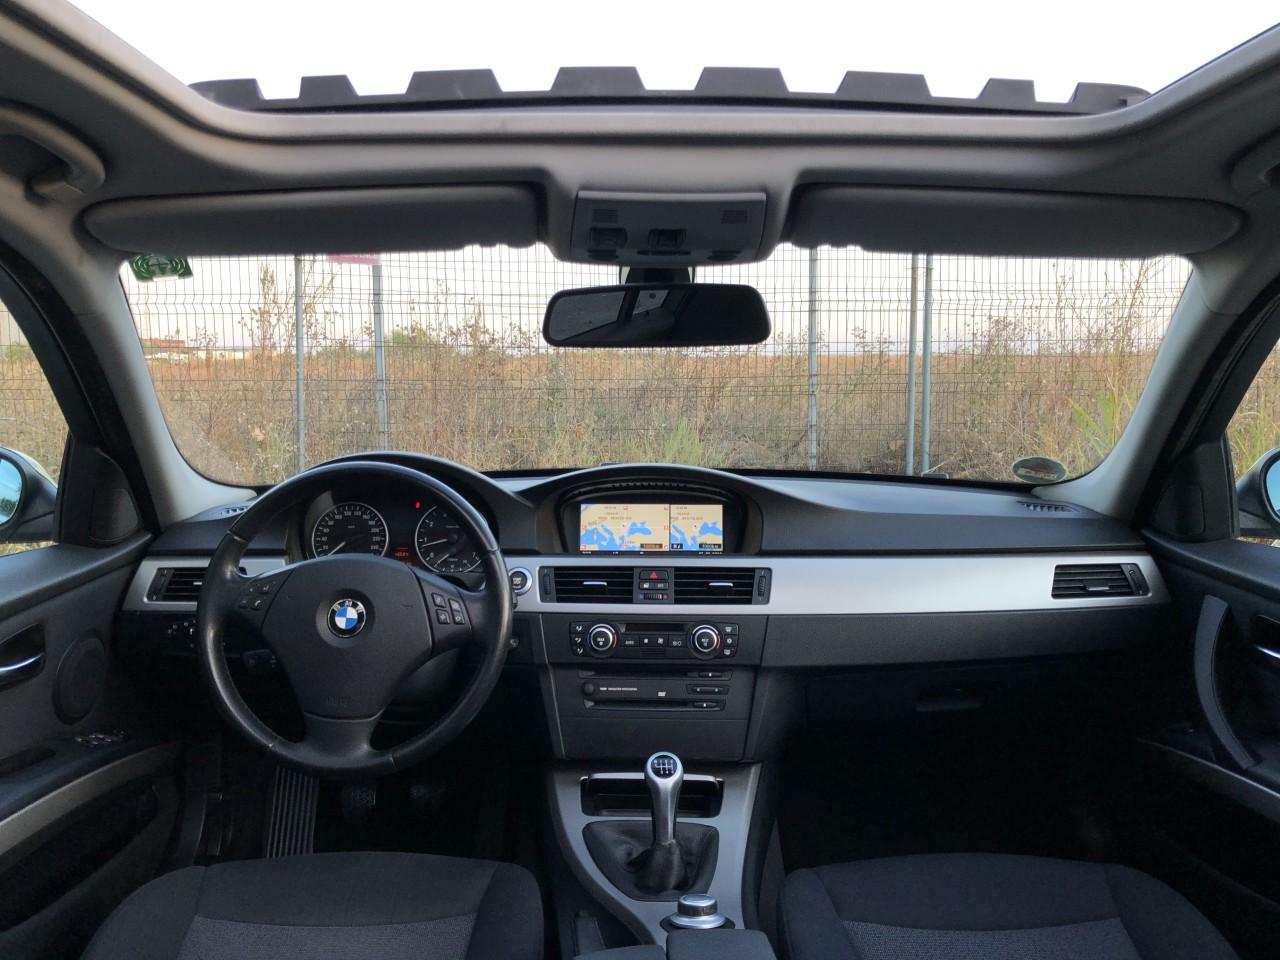 BMW 320 BMW 320i 150Cp / Navi MARE / Trapa / Bluetooth / Senzori parcare / Magazie 6CD / RECENT ADUSA DIN GERMANIA!!! 2007